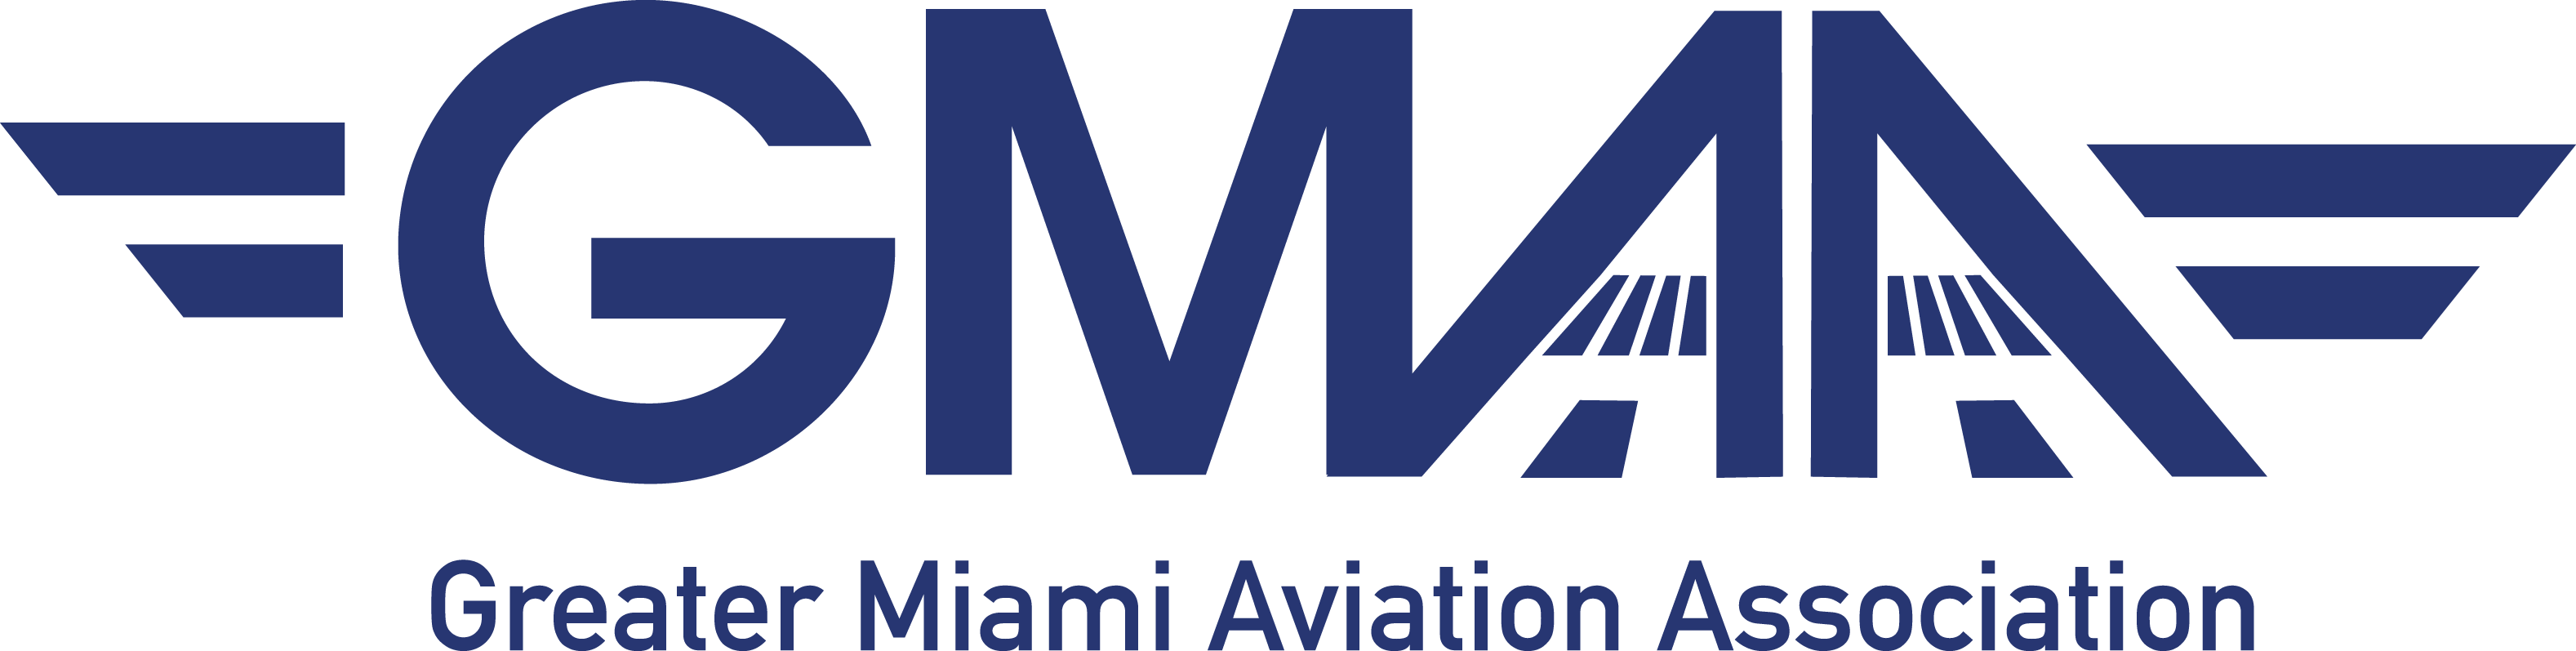 GMAA Wright Brothers Memorial Golf Tournament 2021 - Default Image of GMAA Corporate Membership/Renewal